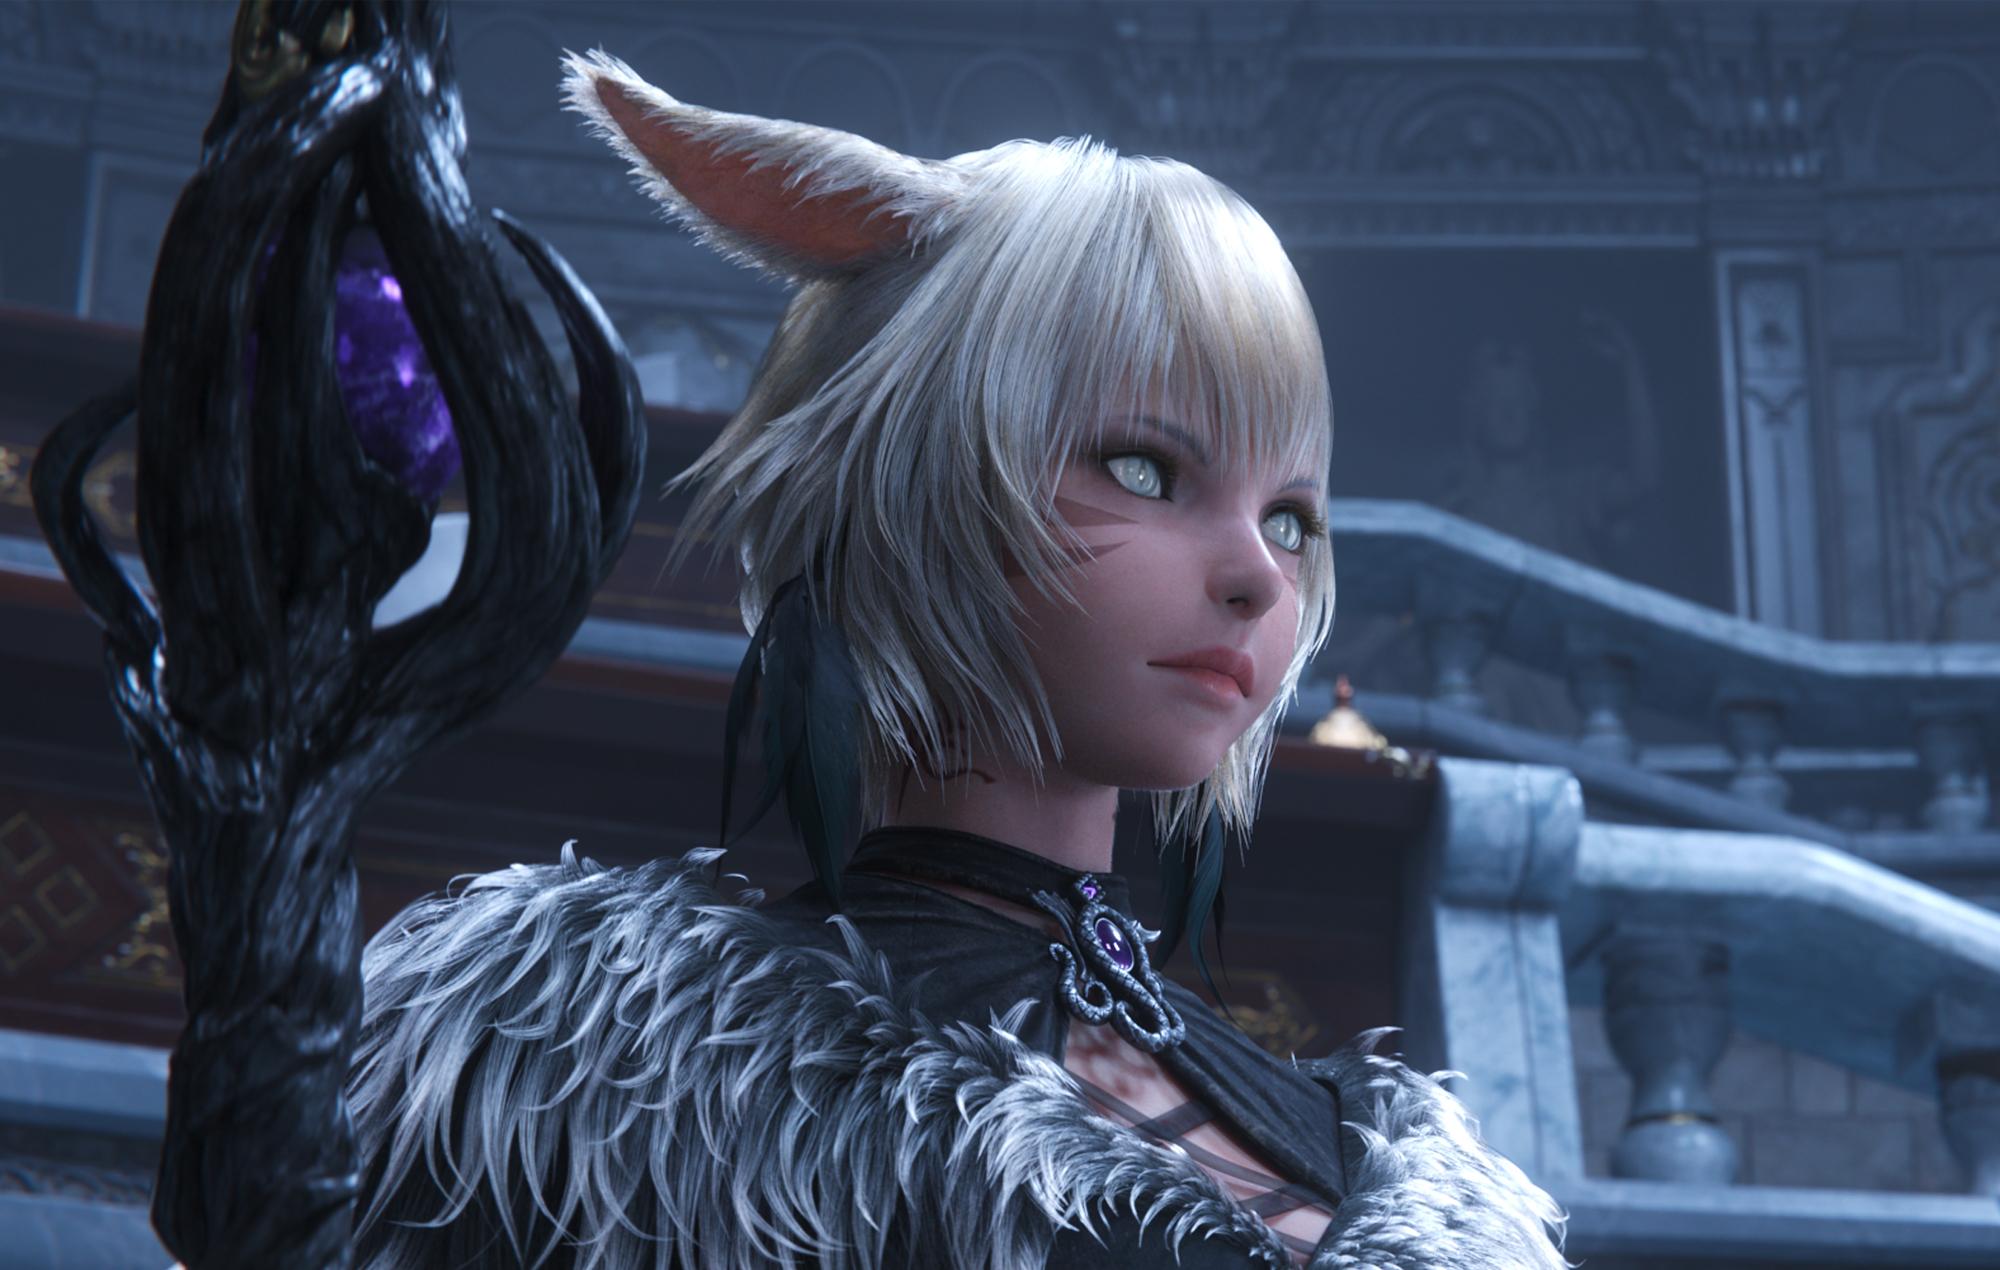 Final Fantasy Xiv Endwalker Gets Extended Trailer Male Viera And More